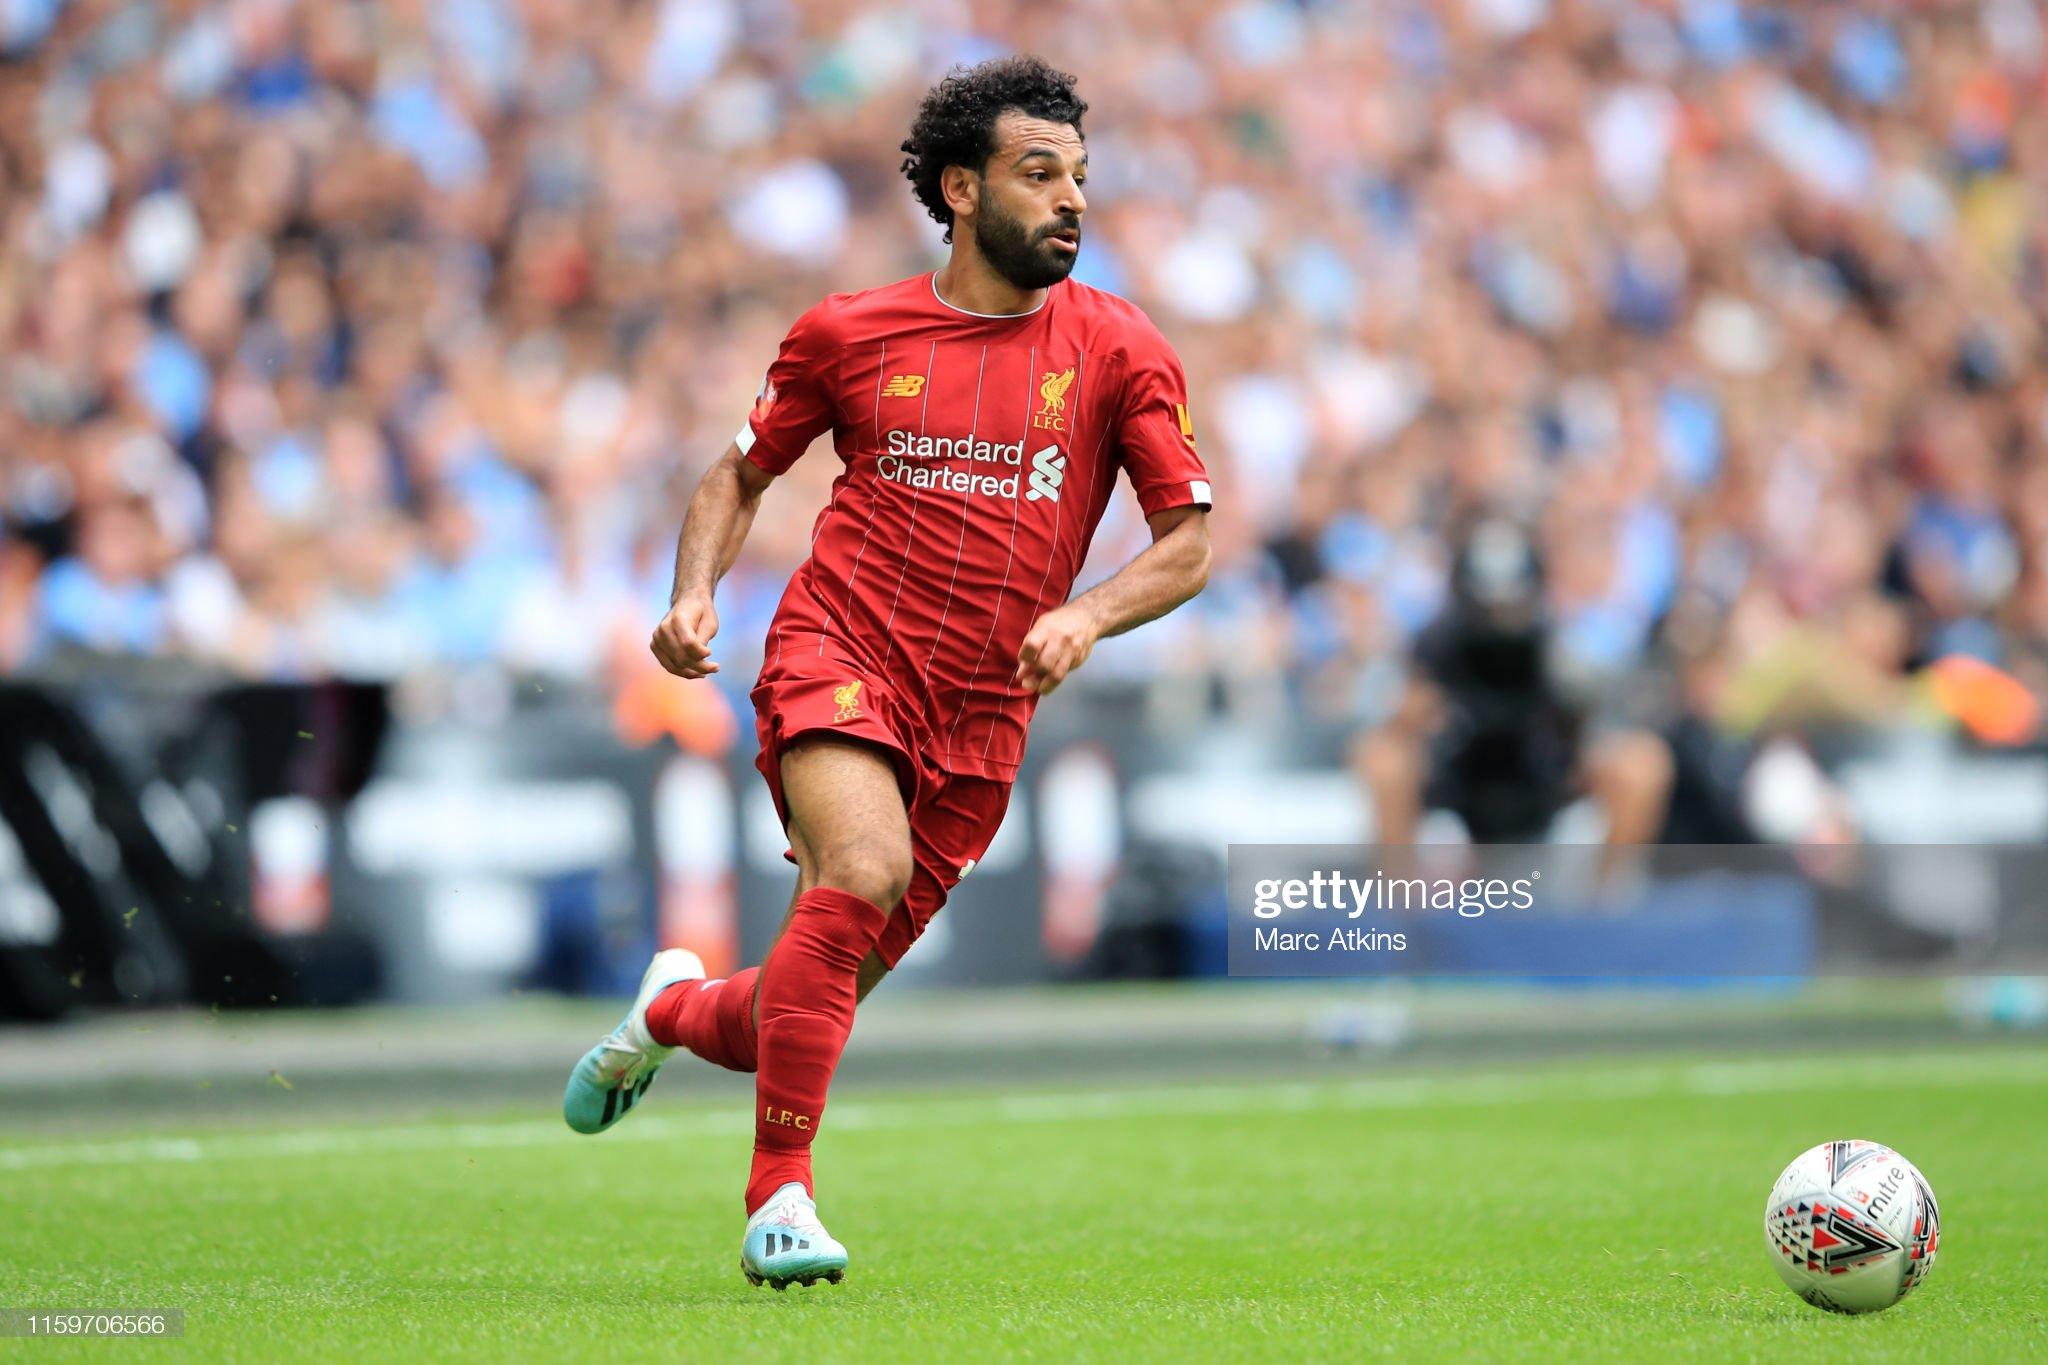 Liverpool v Man City - FA Community Shield : News Photo